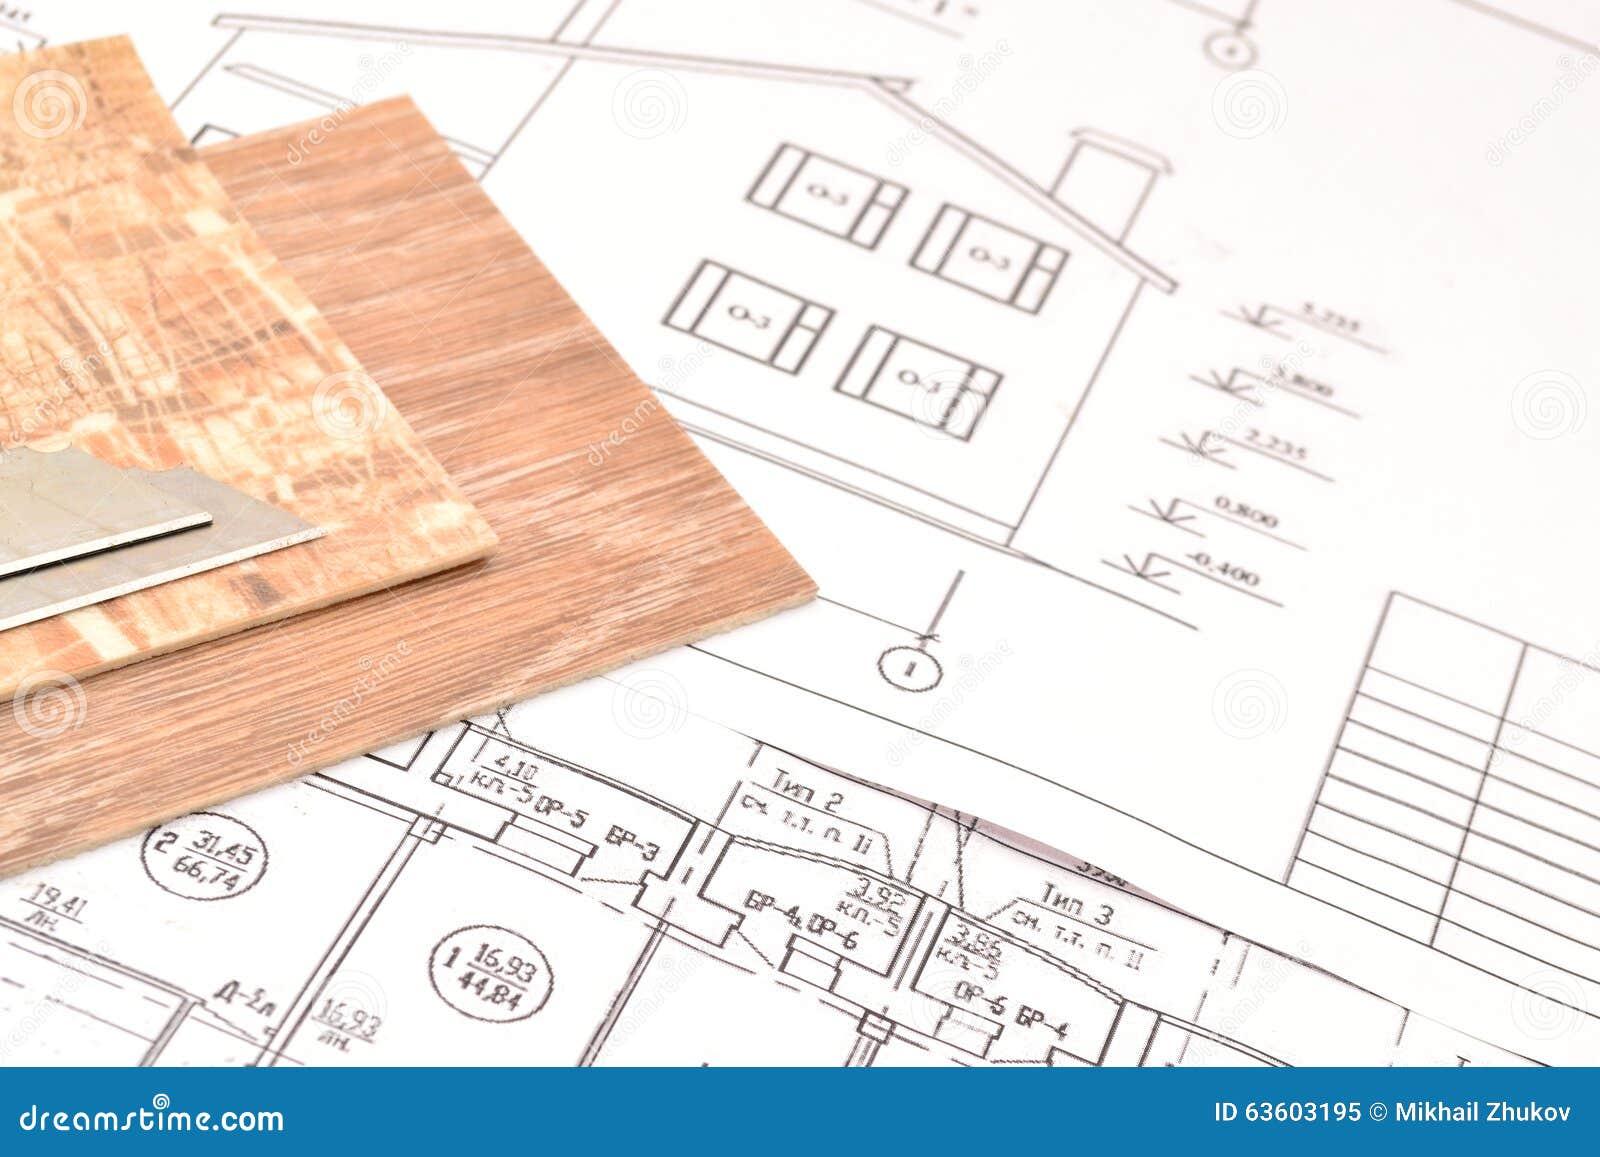 Linoleum Frooring Project Stock Photo Image 63603195